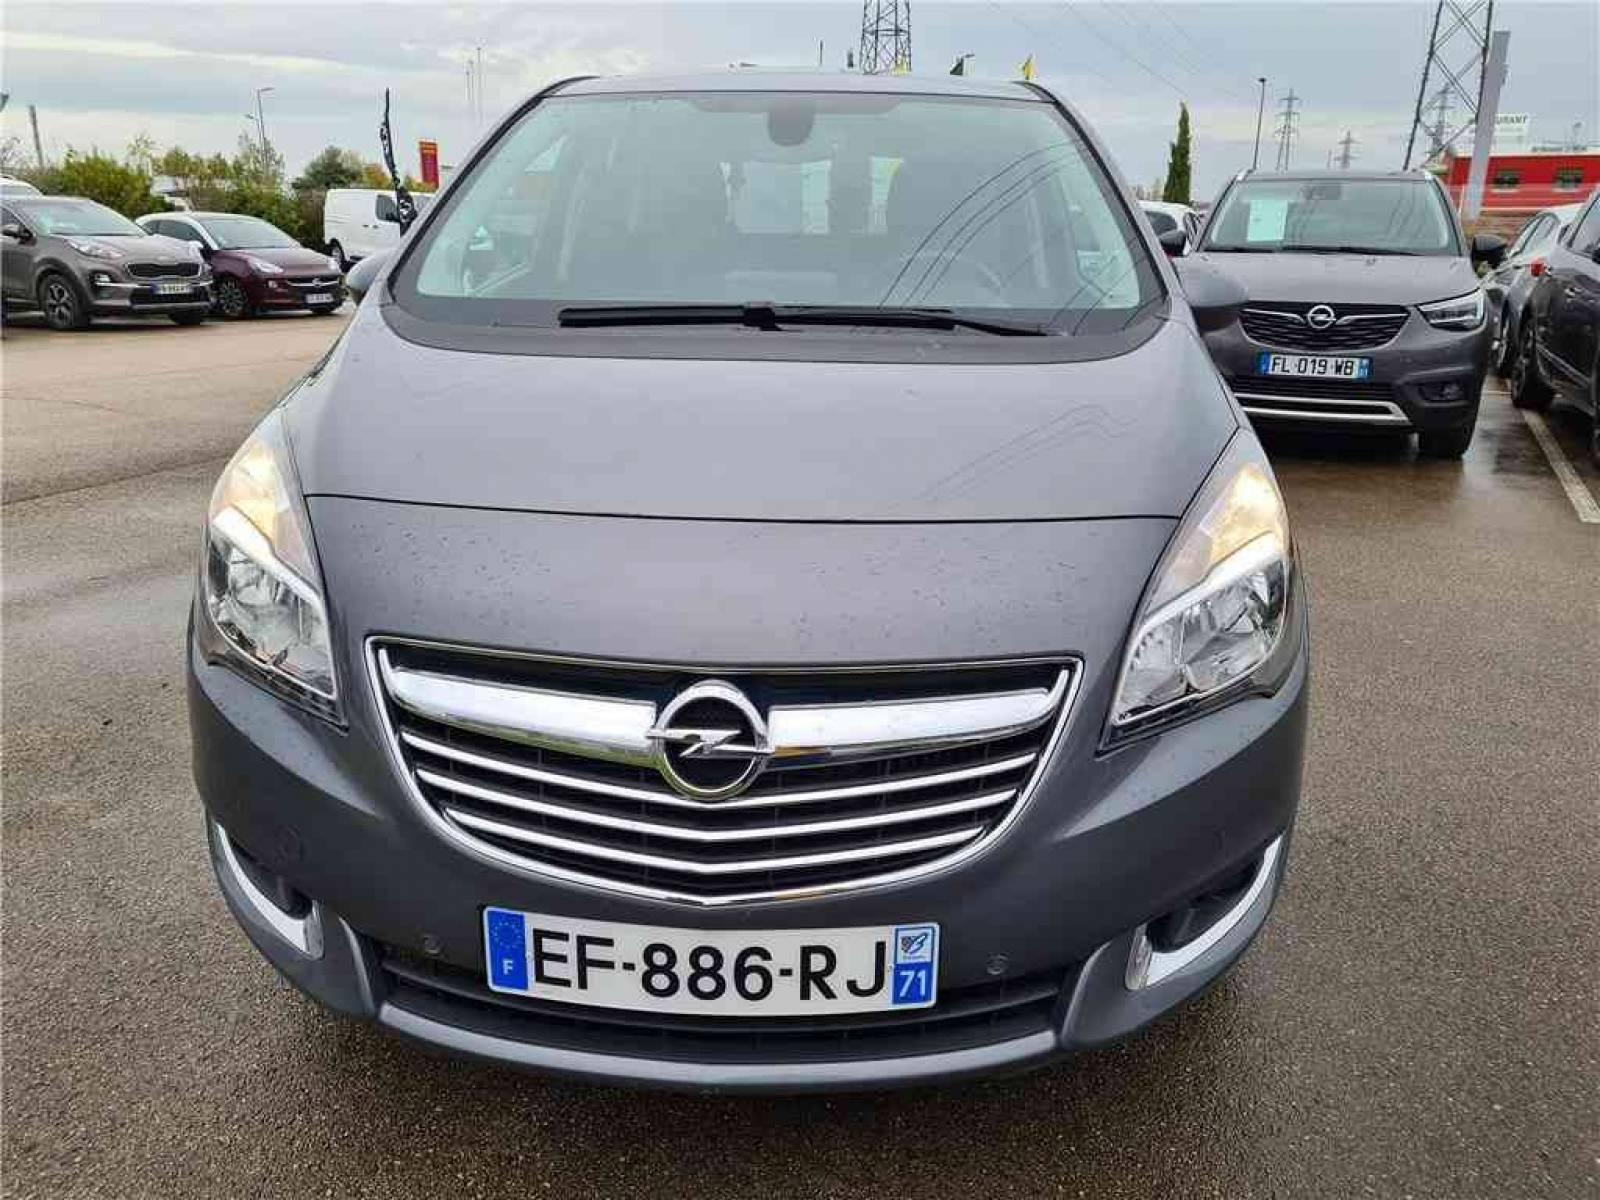 OPEL Meriva 1.6 CDTI - 110 ch Start/Stop - véhicule d'occasion - Groupe Guillet - Opel Magicauto - Chalon-sur-Saône - 71380 - Saint-Marcel - 8